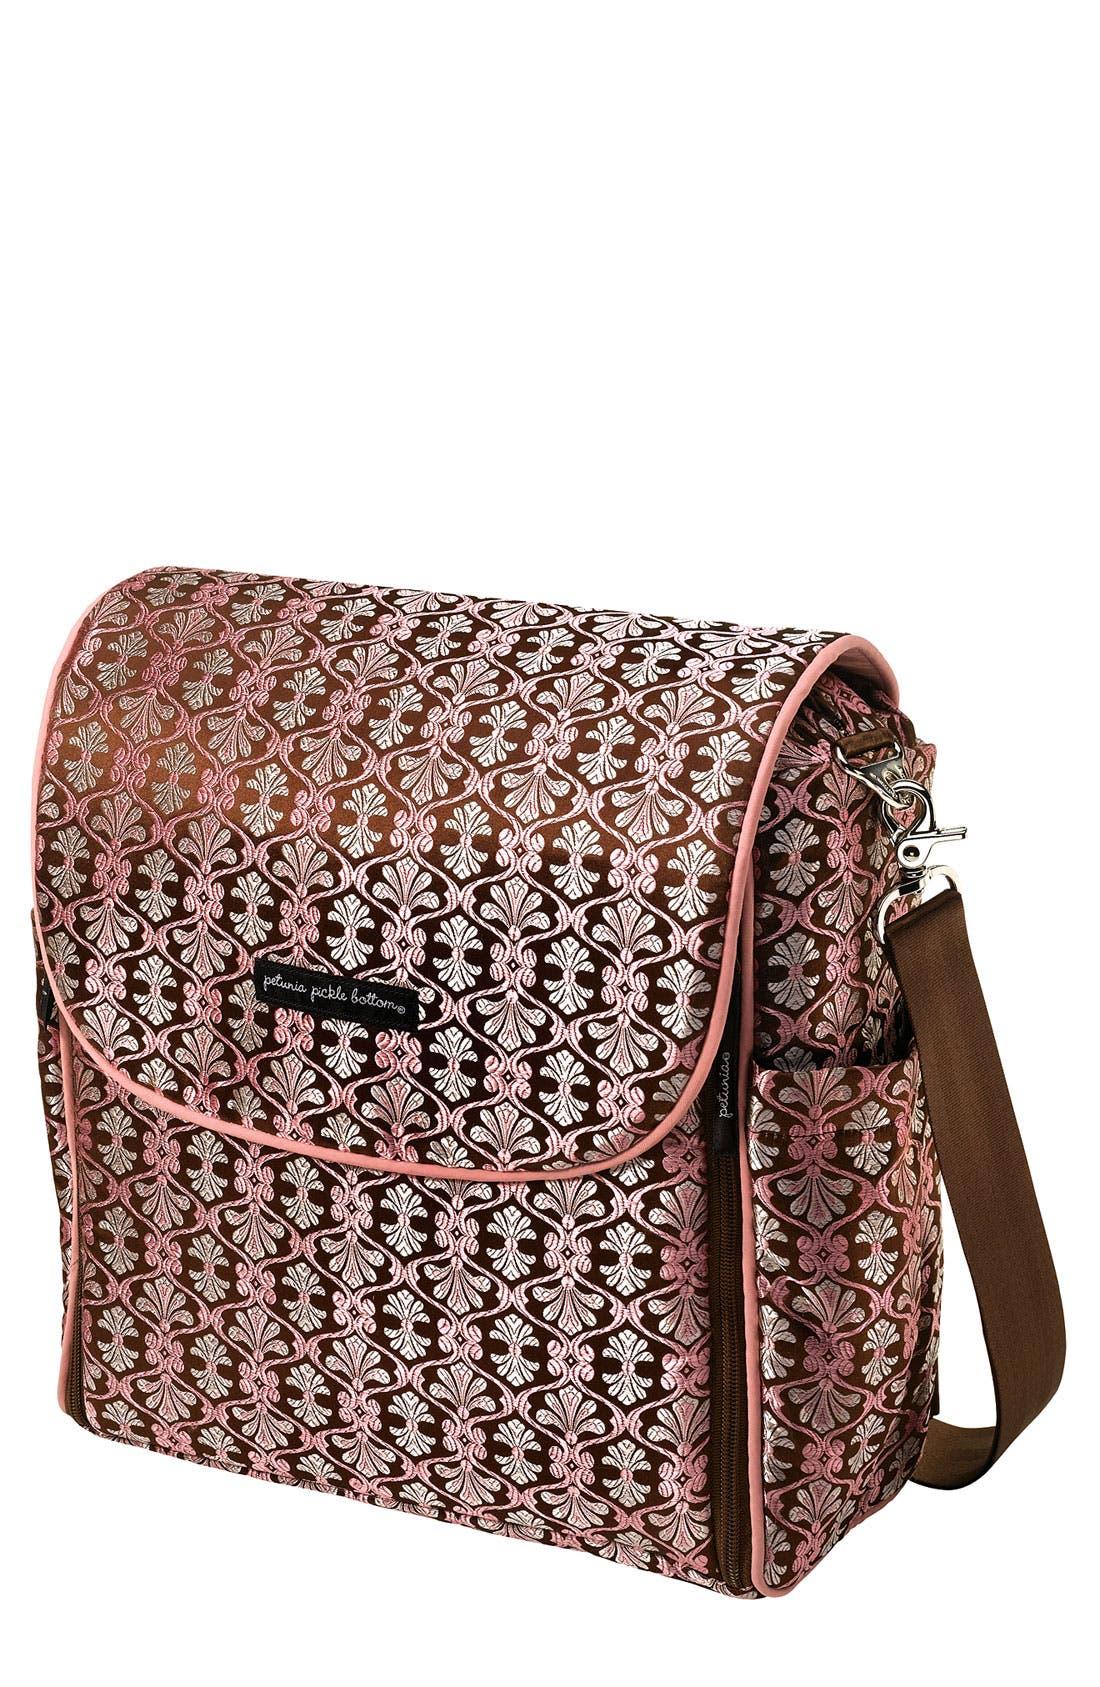 Alternate Image 1 Selected - Petunia Pickle Bottom Brocade 'Boxy Backpack' Diaper Bag